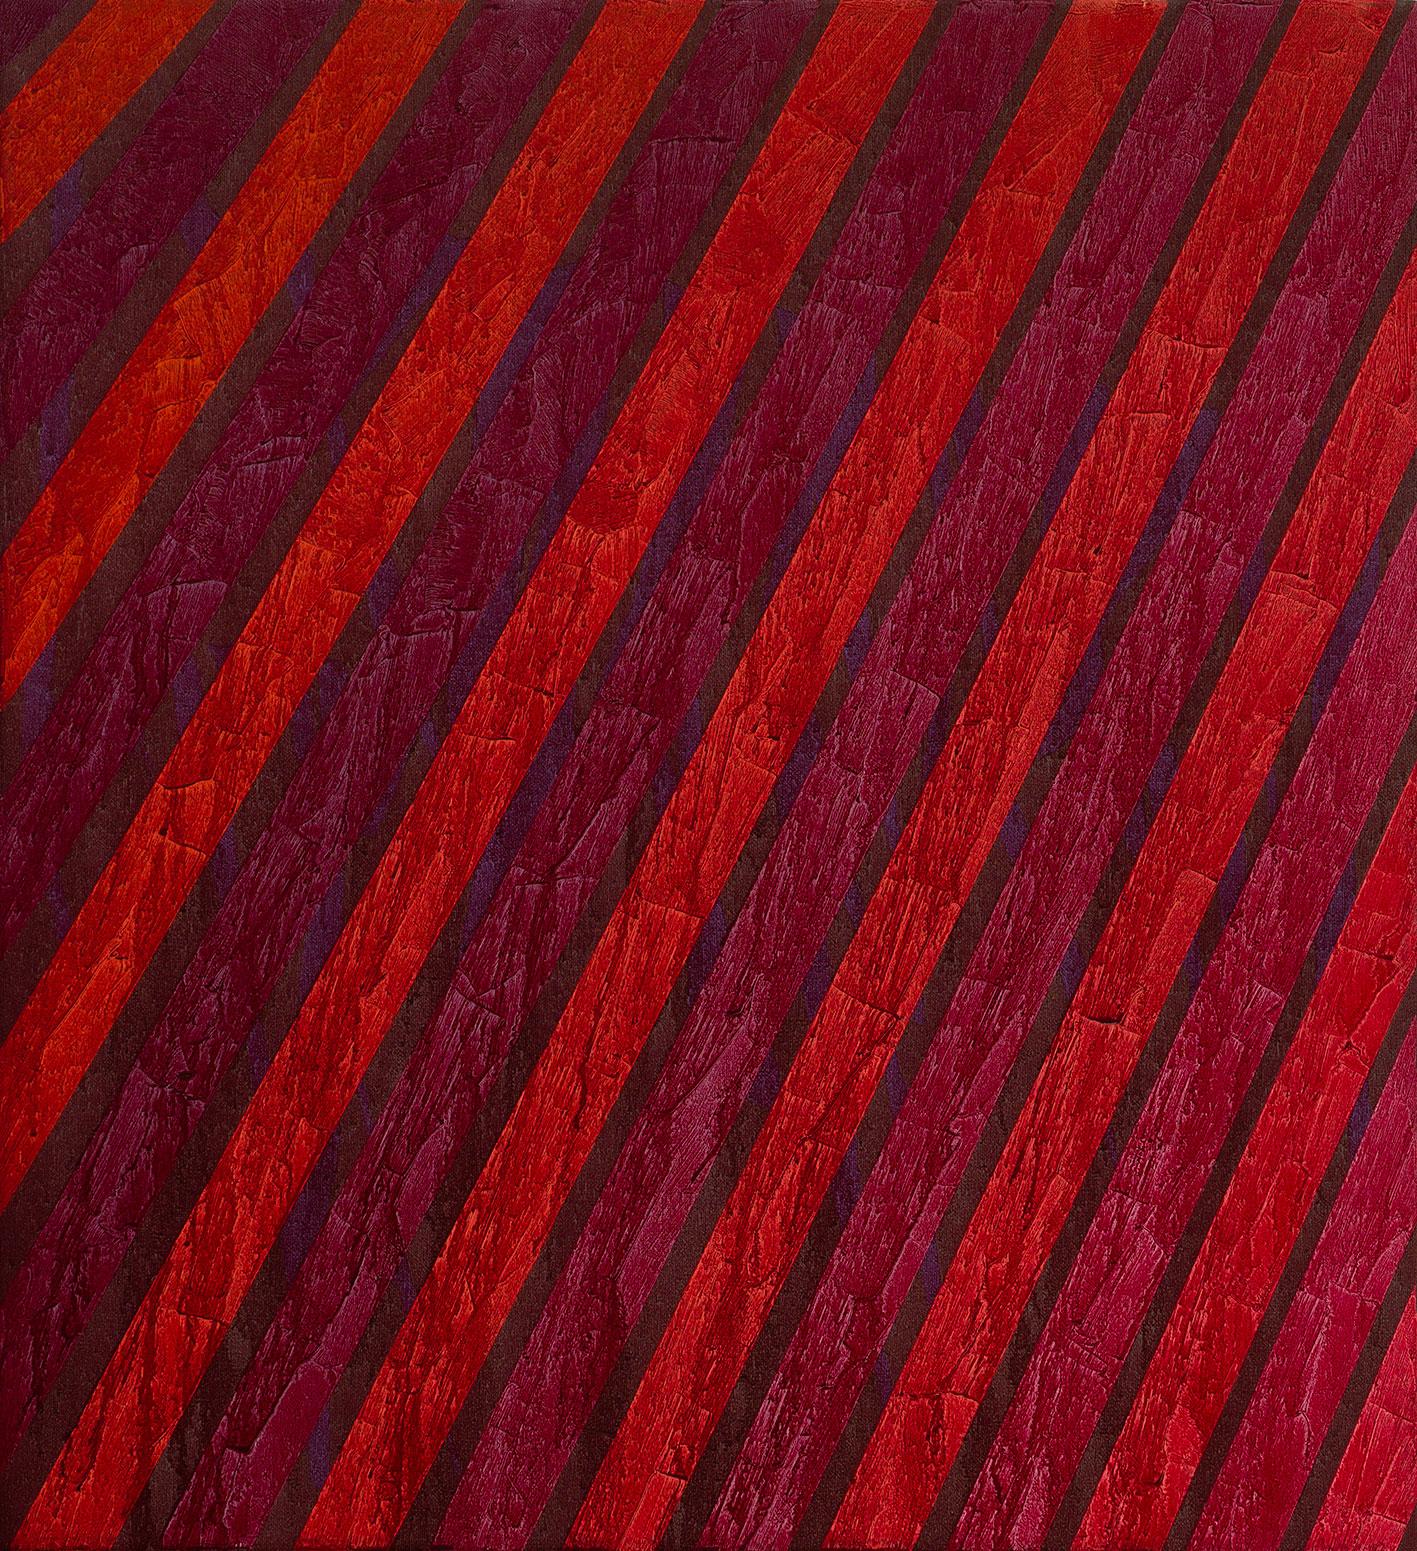 Crimson window | 2015